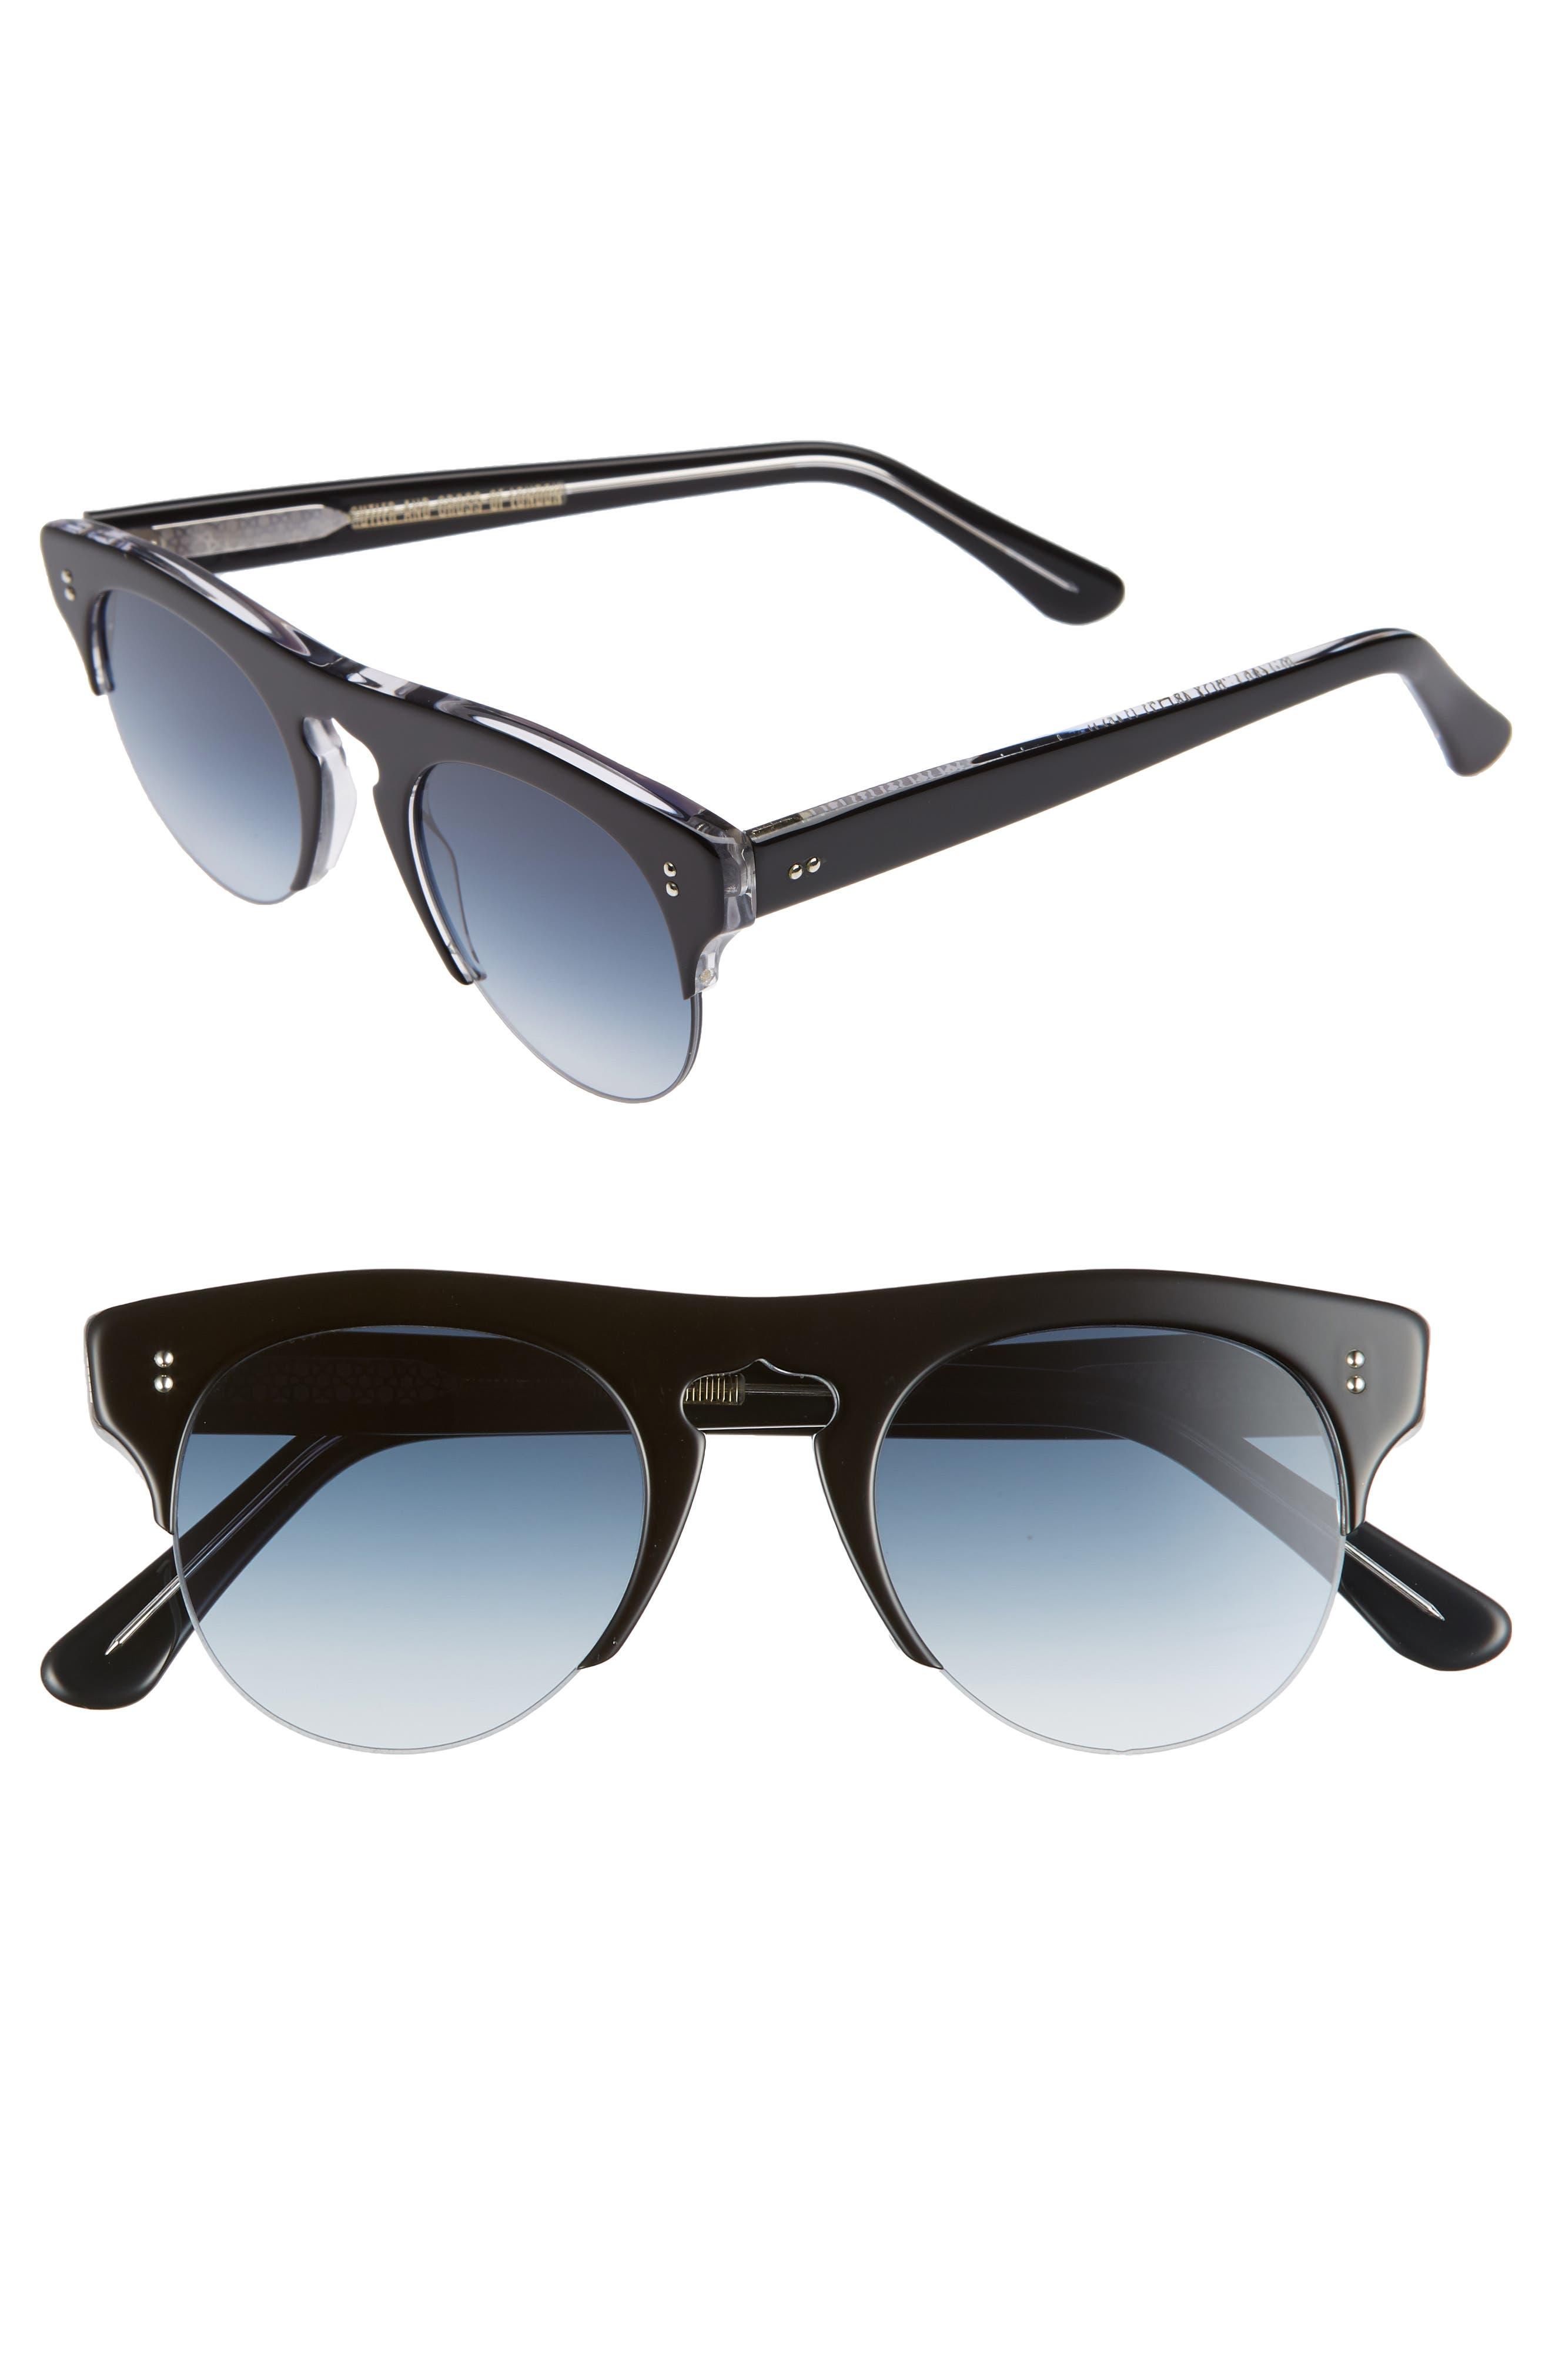 48mm Polarized Browline Sunglasses,                         Main,                         color, BLACK ON CRYSTAL/ BLUE